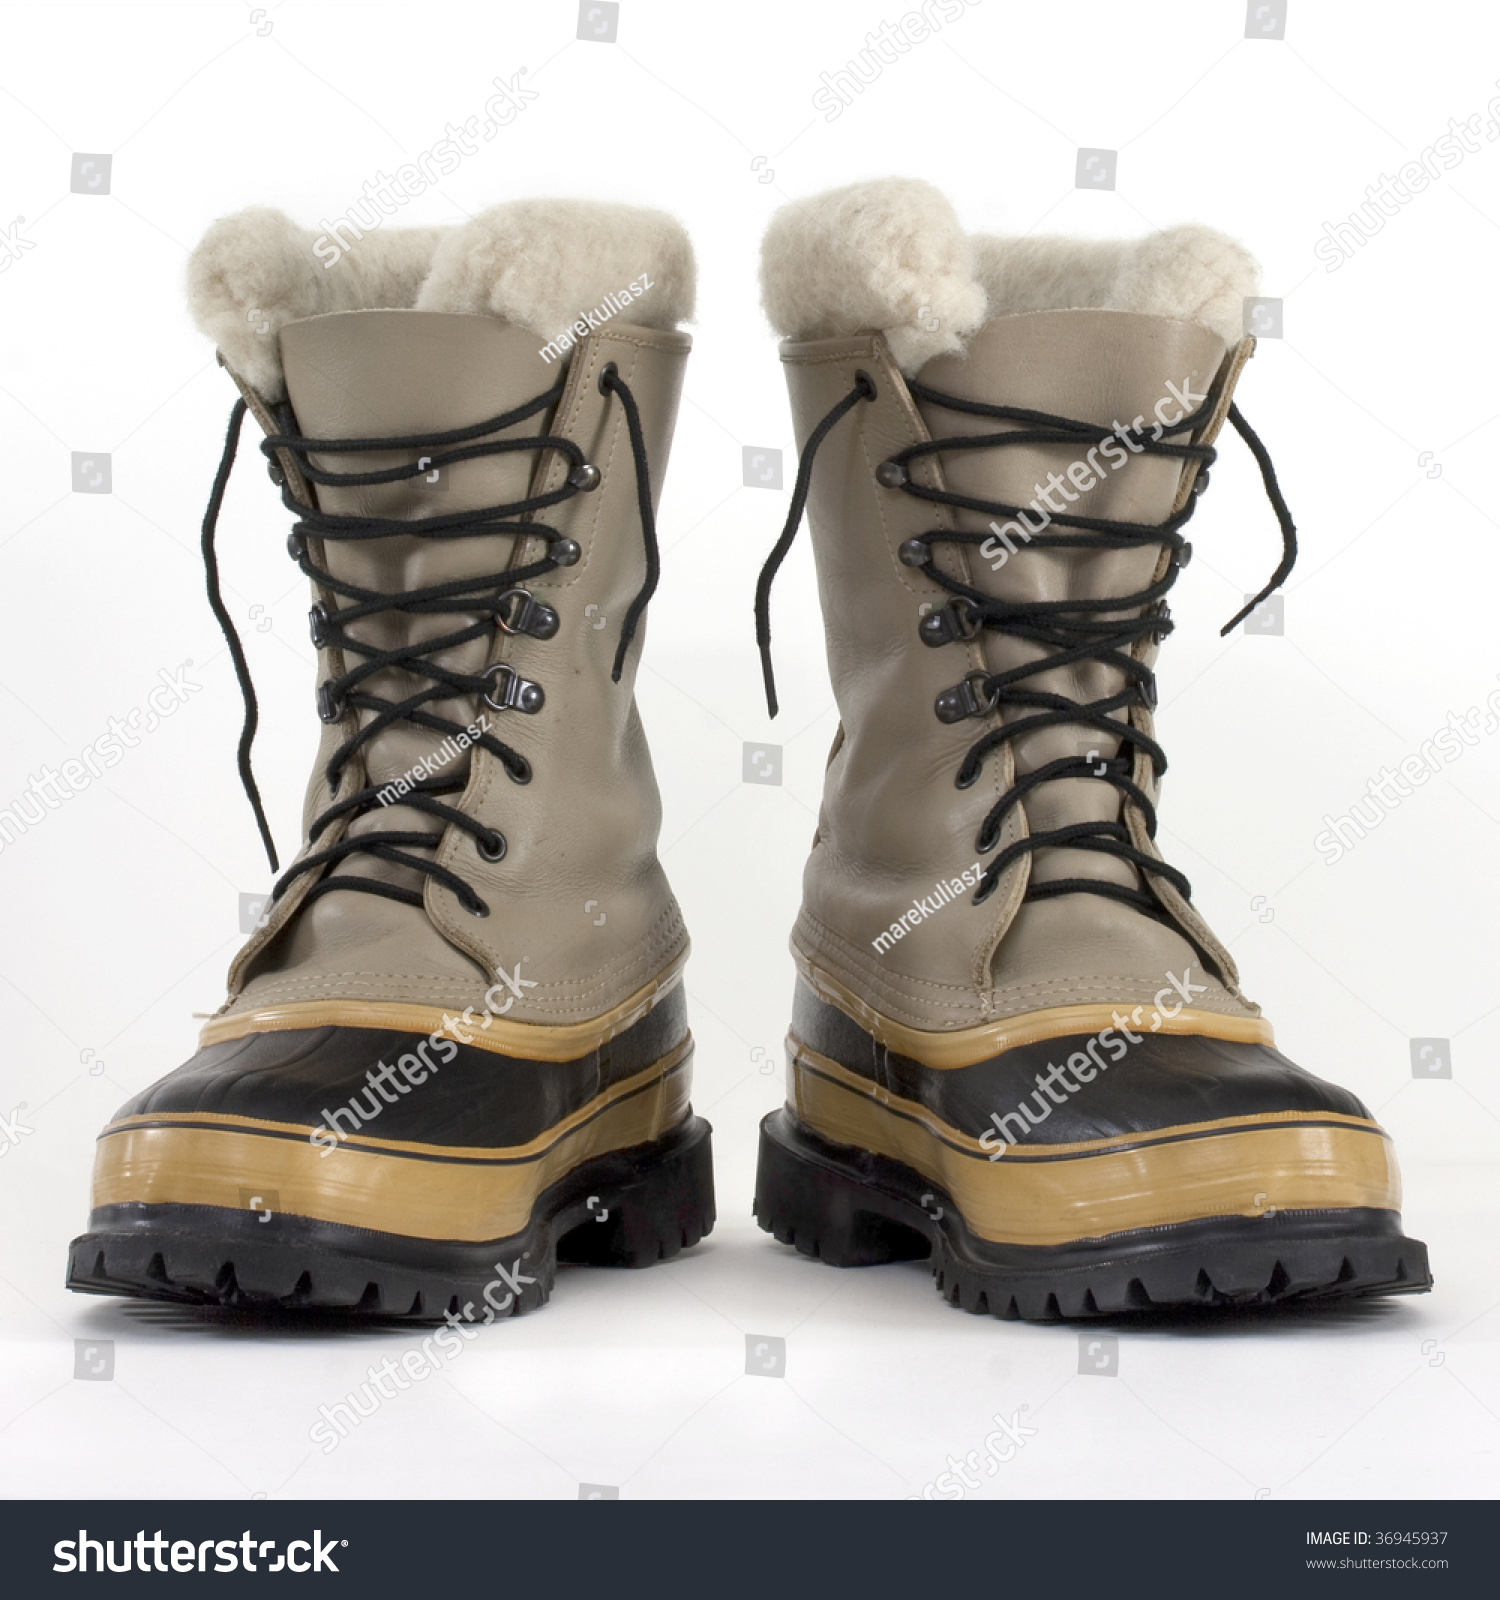 snowboots pair heavy snow boots on white stock photo 36945937 - shutterstock MRPATDG